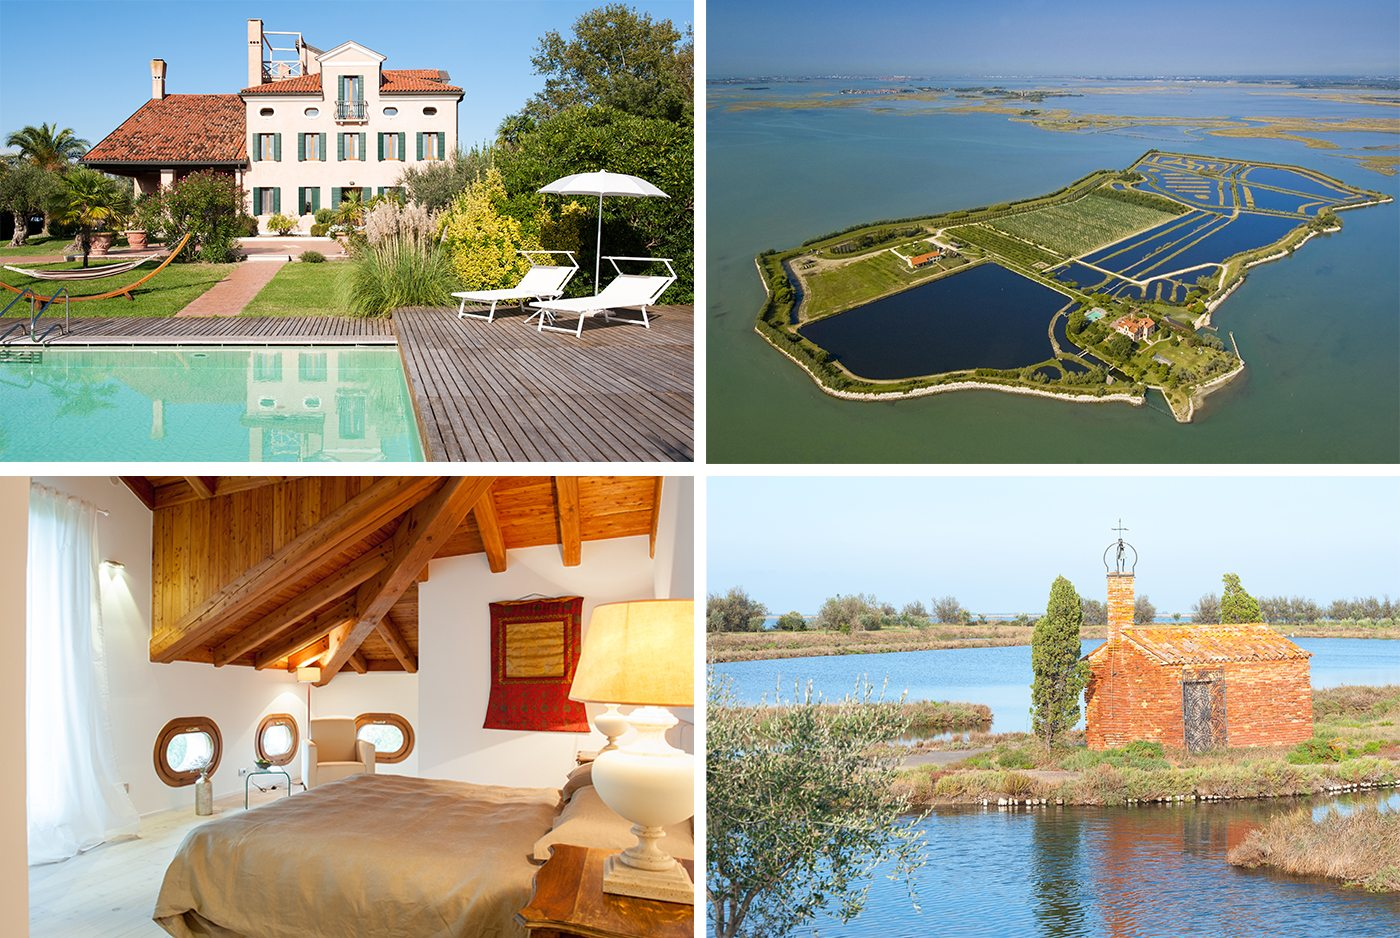 isola cristina - charming places